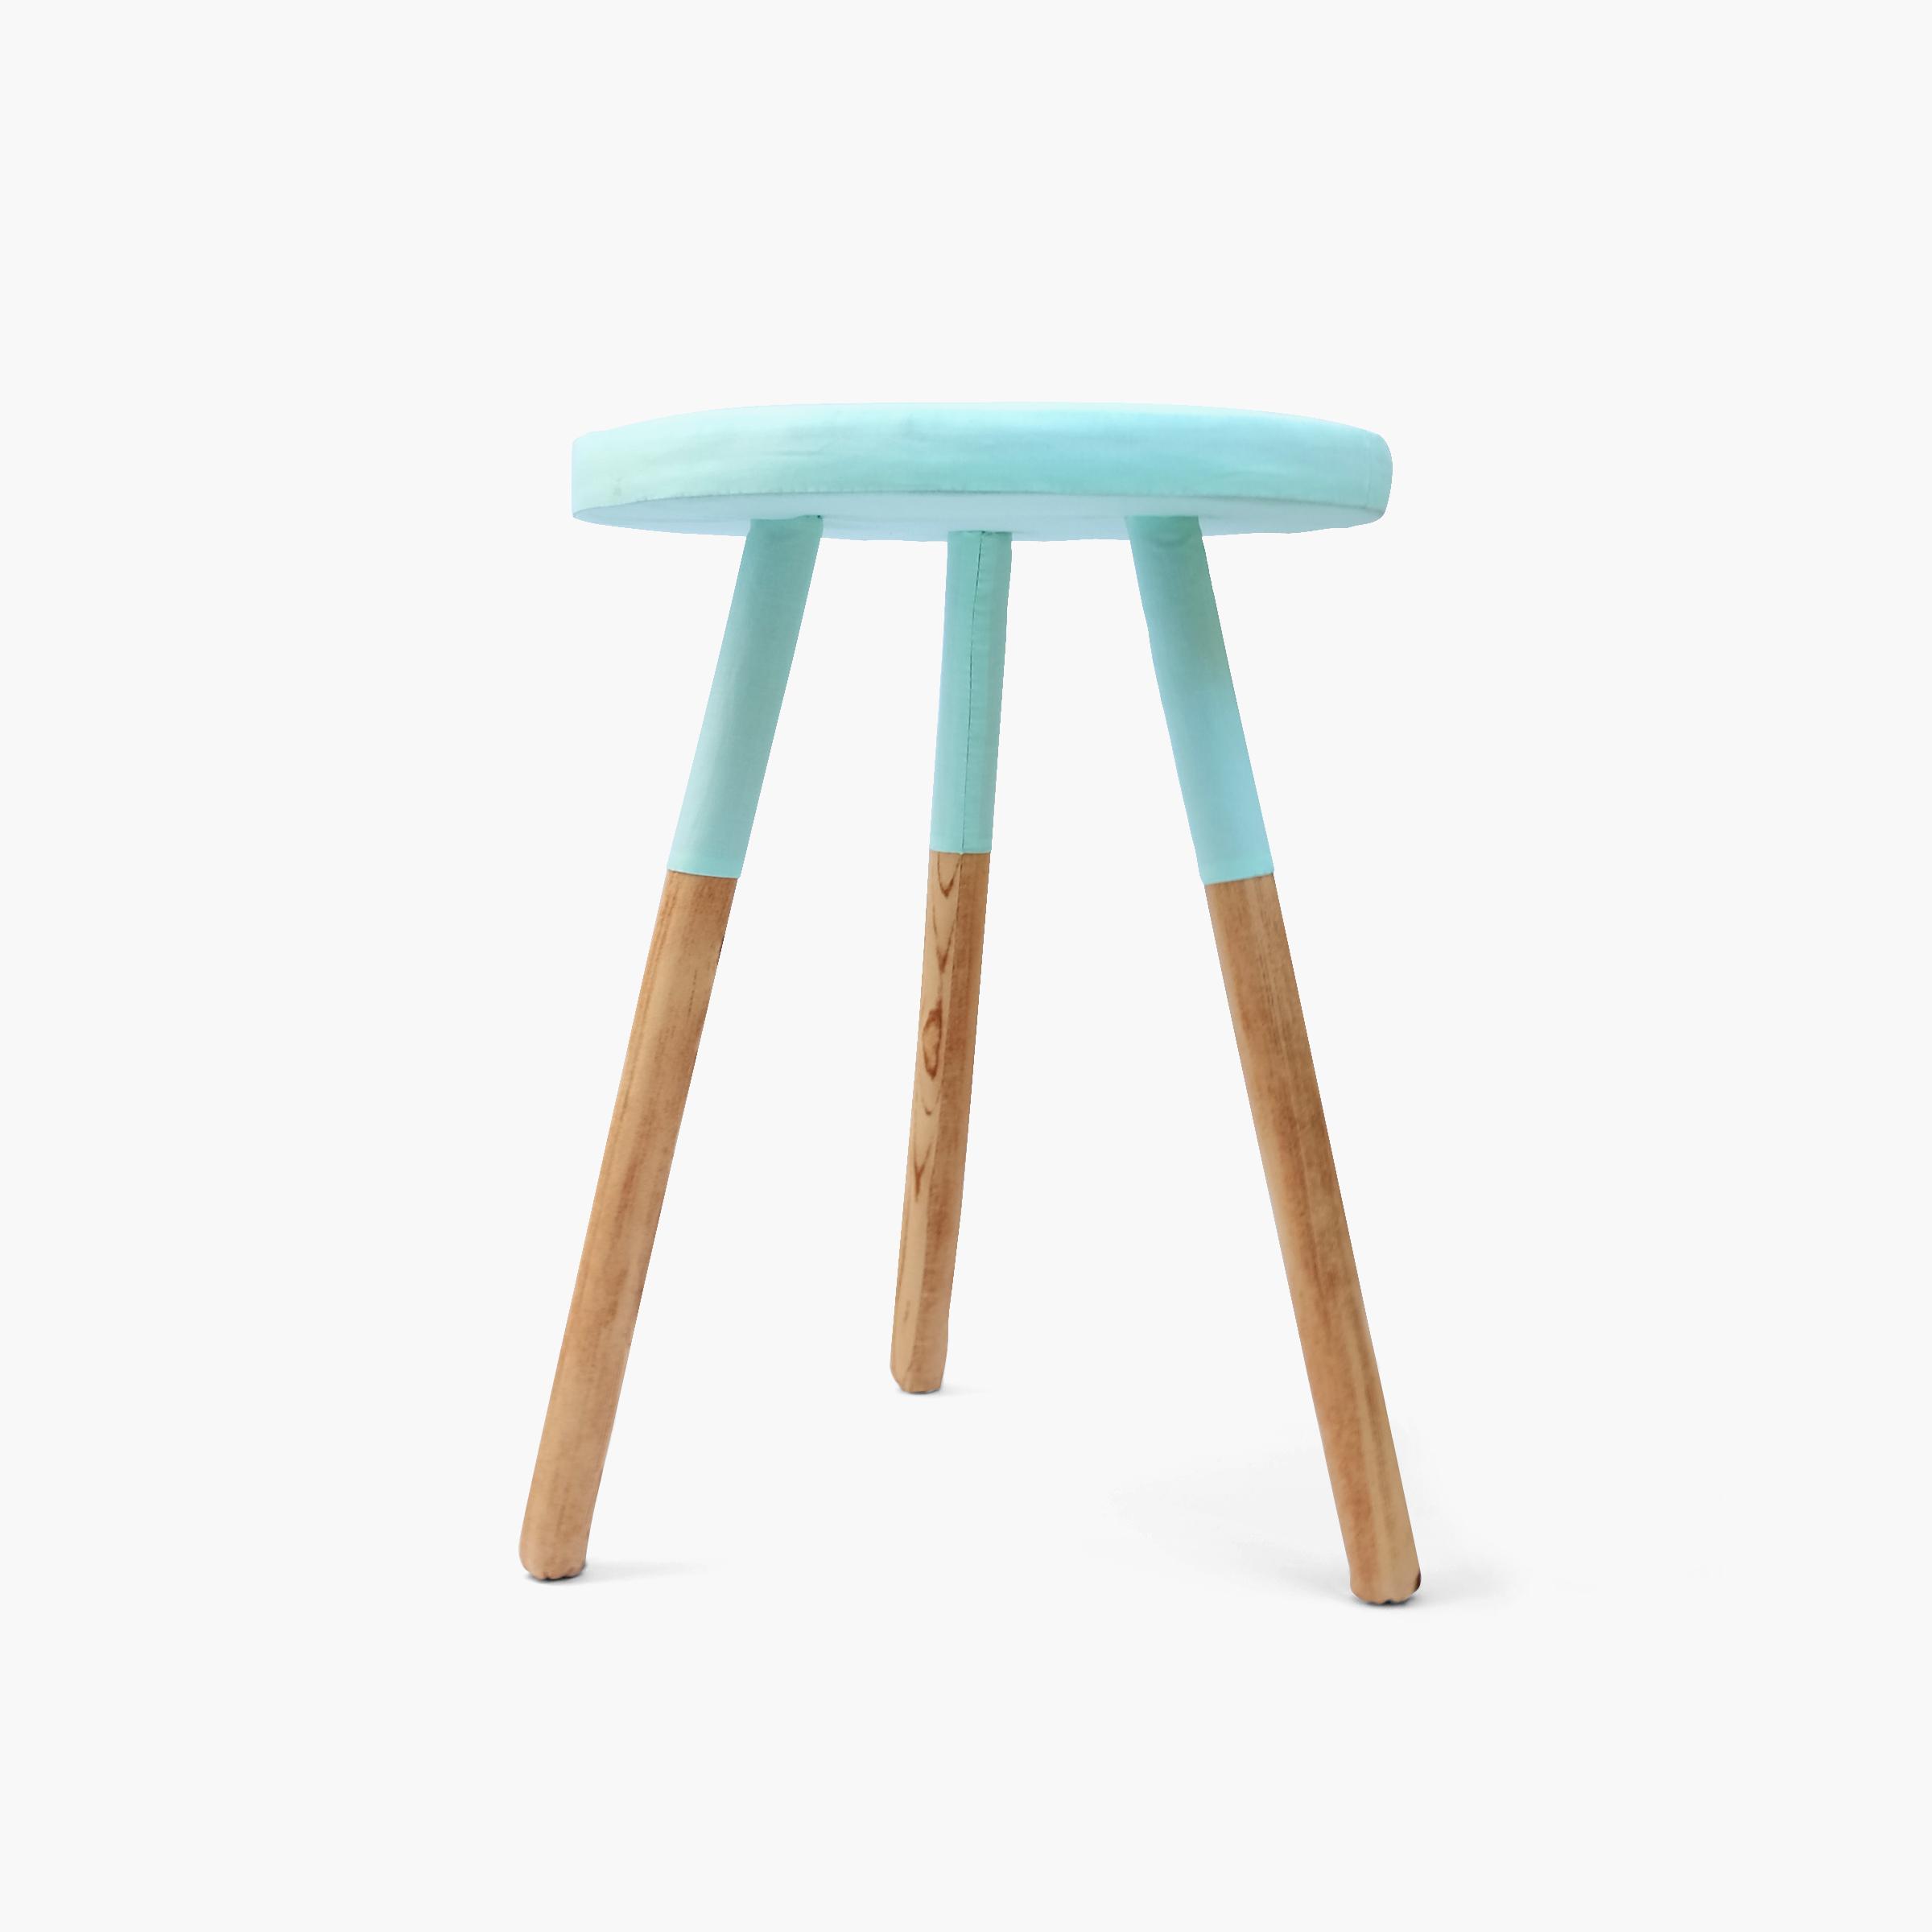 DIY Weekend    Paint-dipped milking stool   Hardwood dowel, foam, felt, cotton cloth 18.5 x 13.5 x 13.5 in 2015